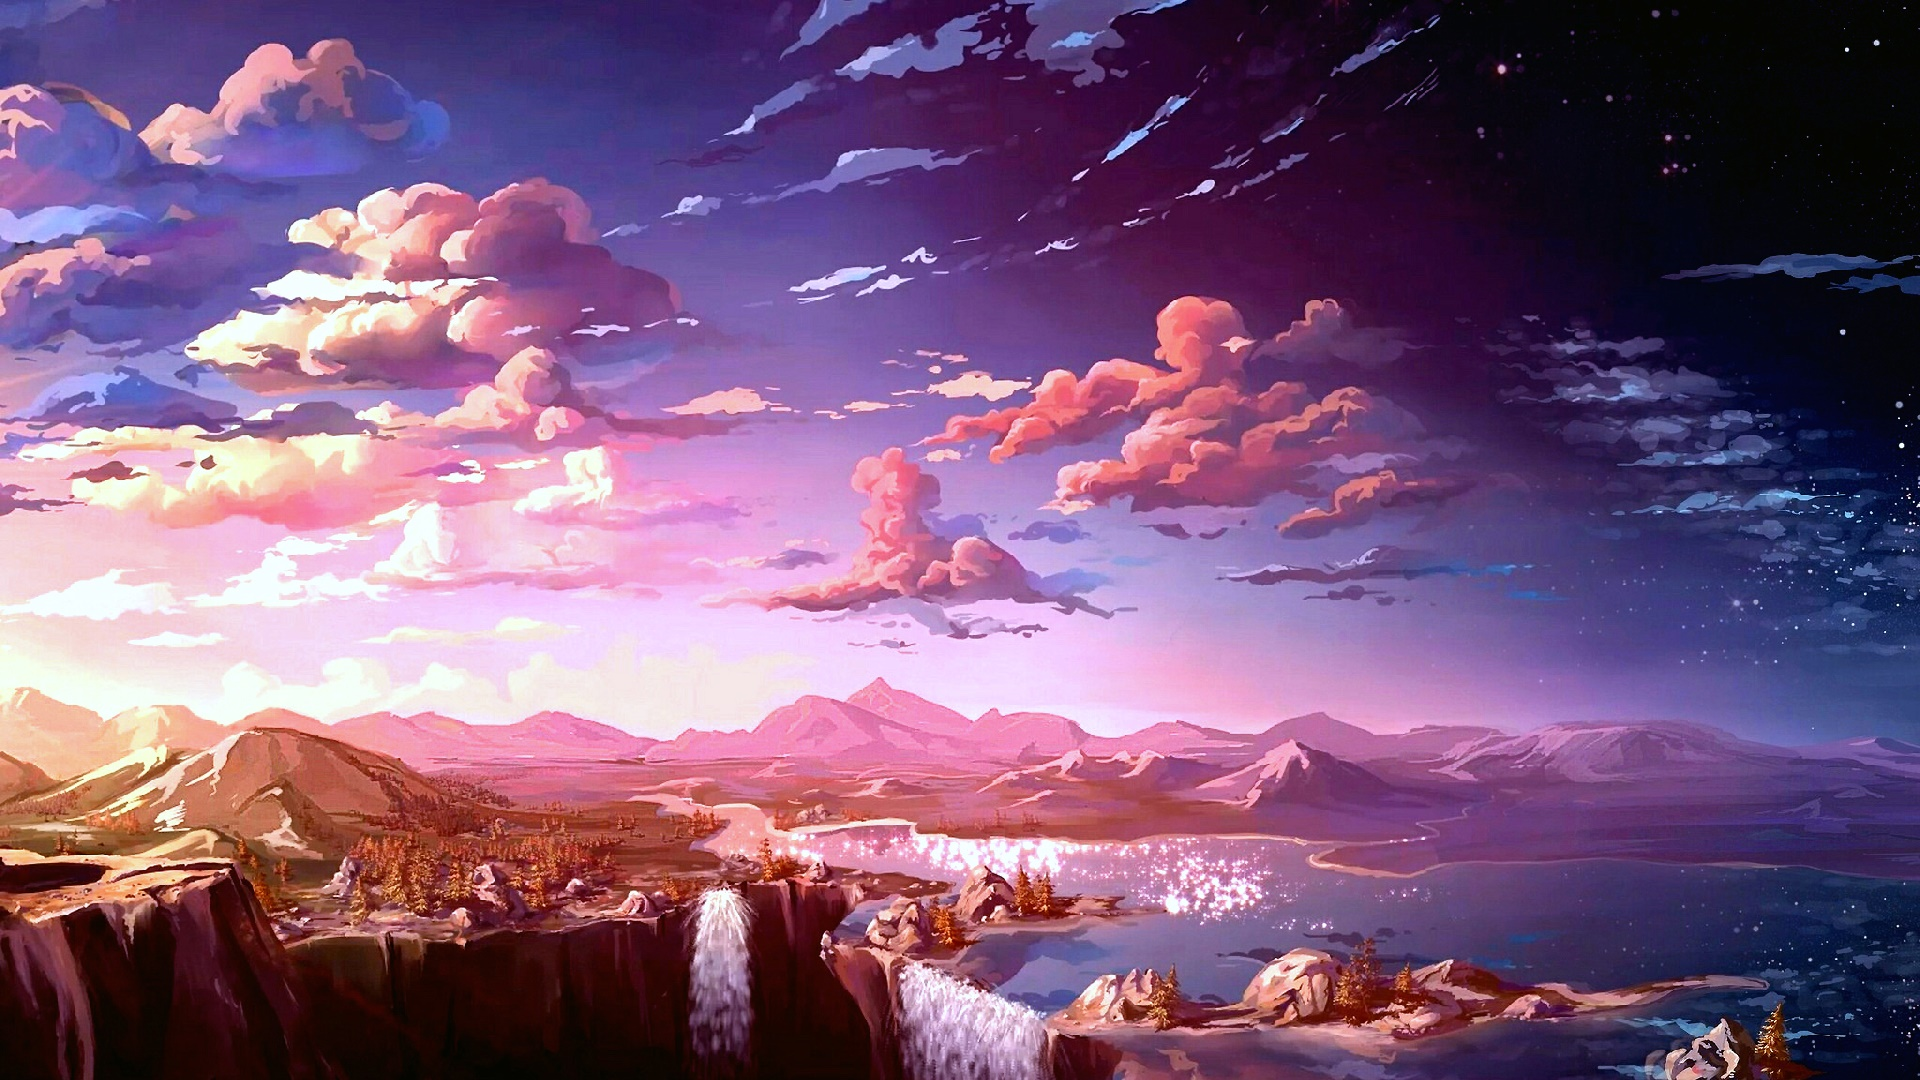 Cloud Landscape Mountain Sky 1920x1080